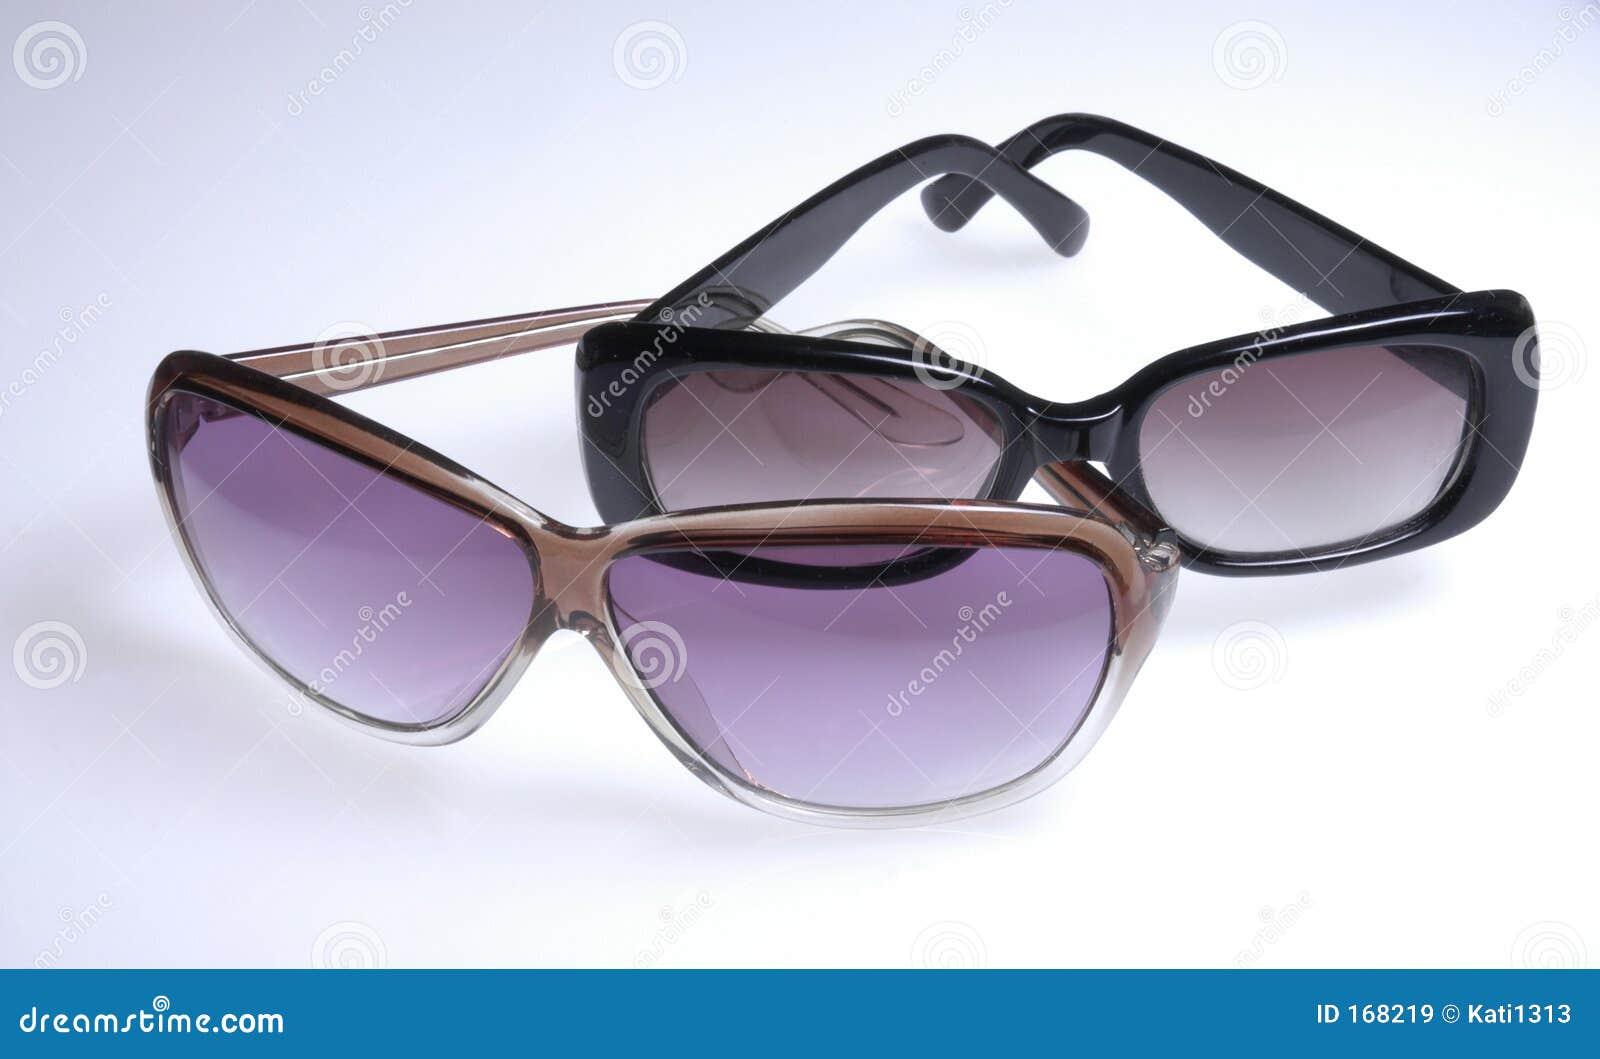 Two sunglasses